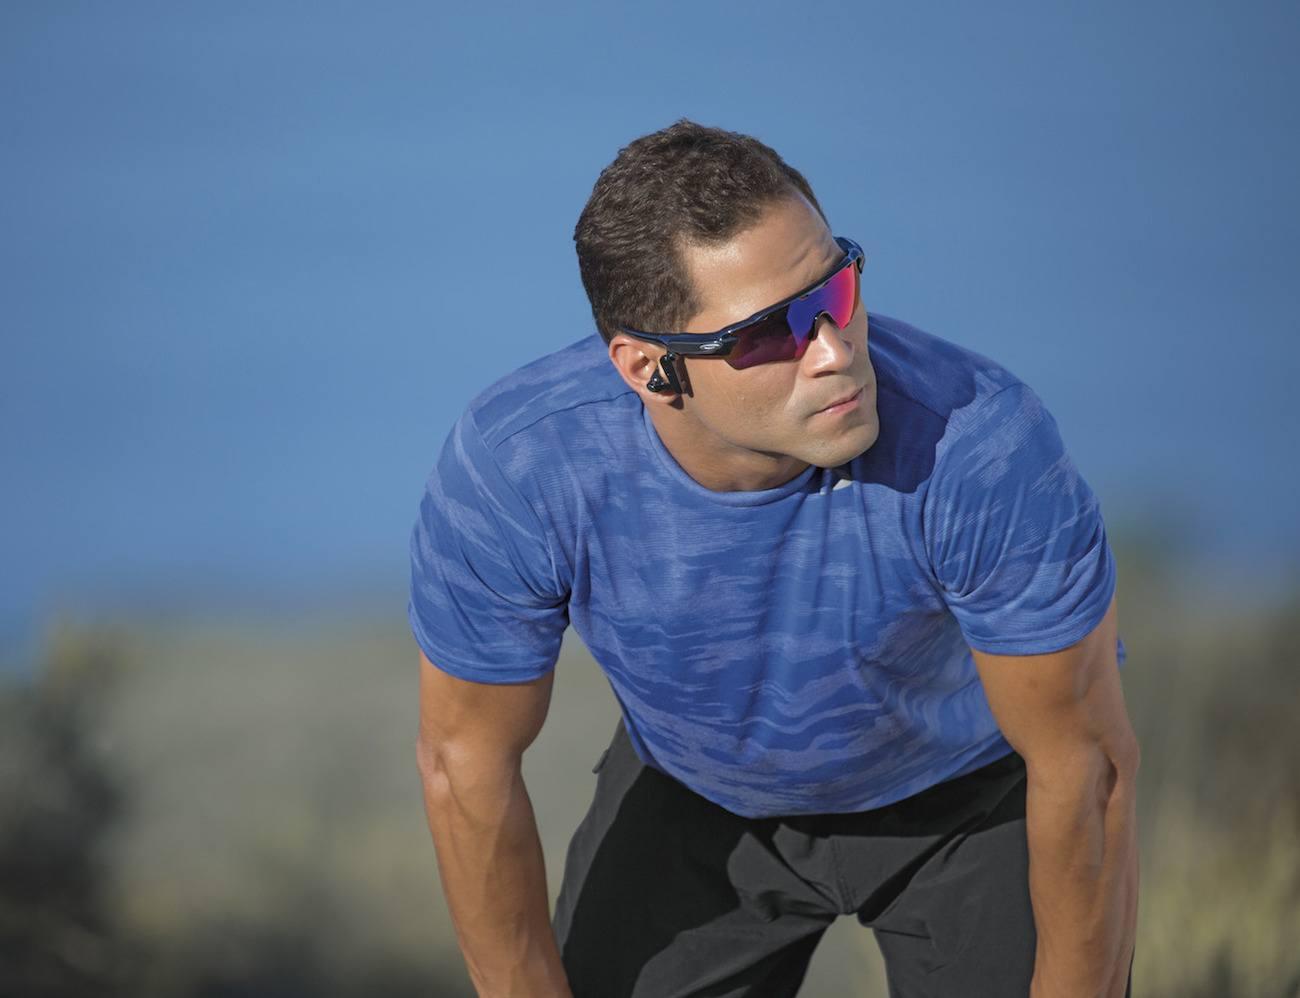 Radar Pace Sunglasses and Training System